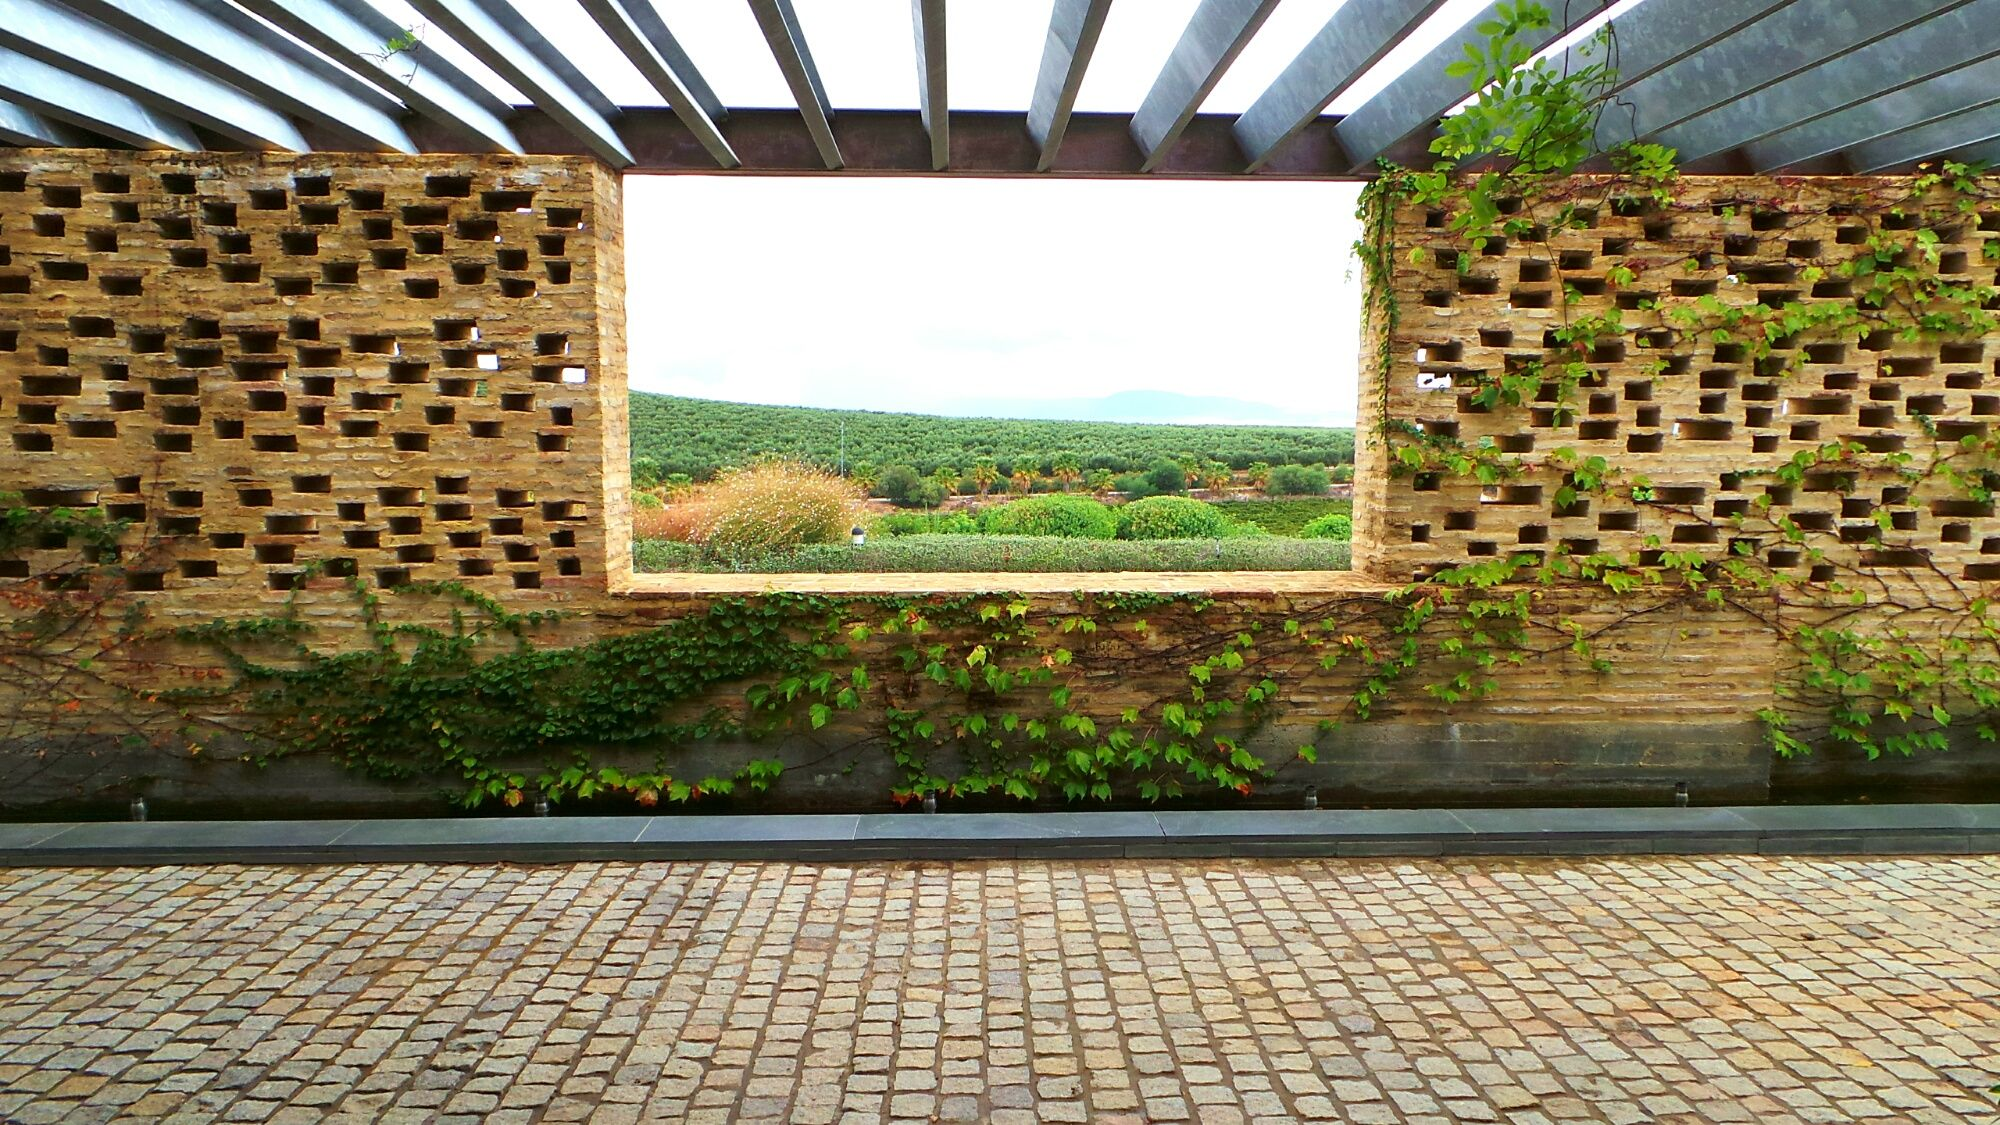 Bodega Entrechuelos de Miguel Domecq, una ventana a tus sentidos | MIRA Jerez